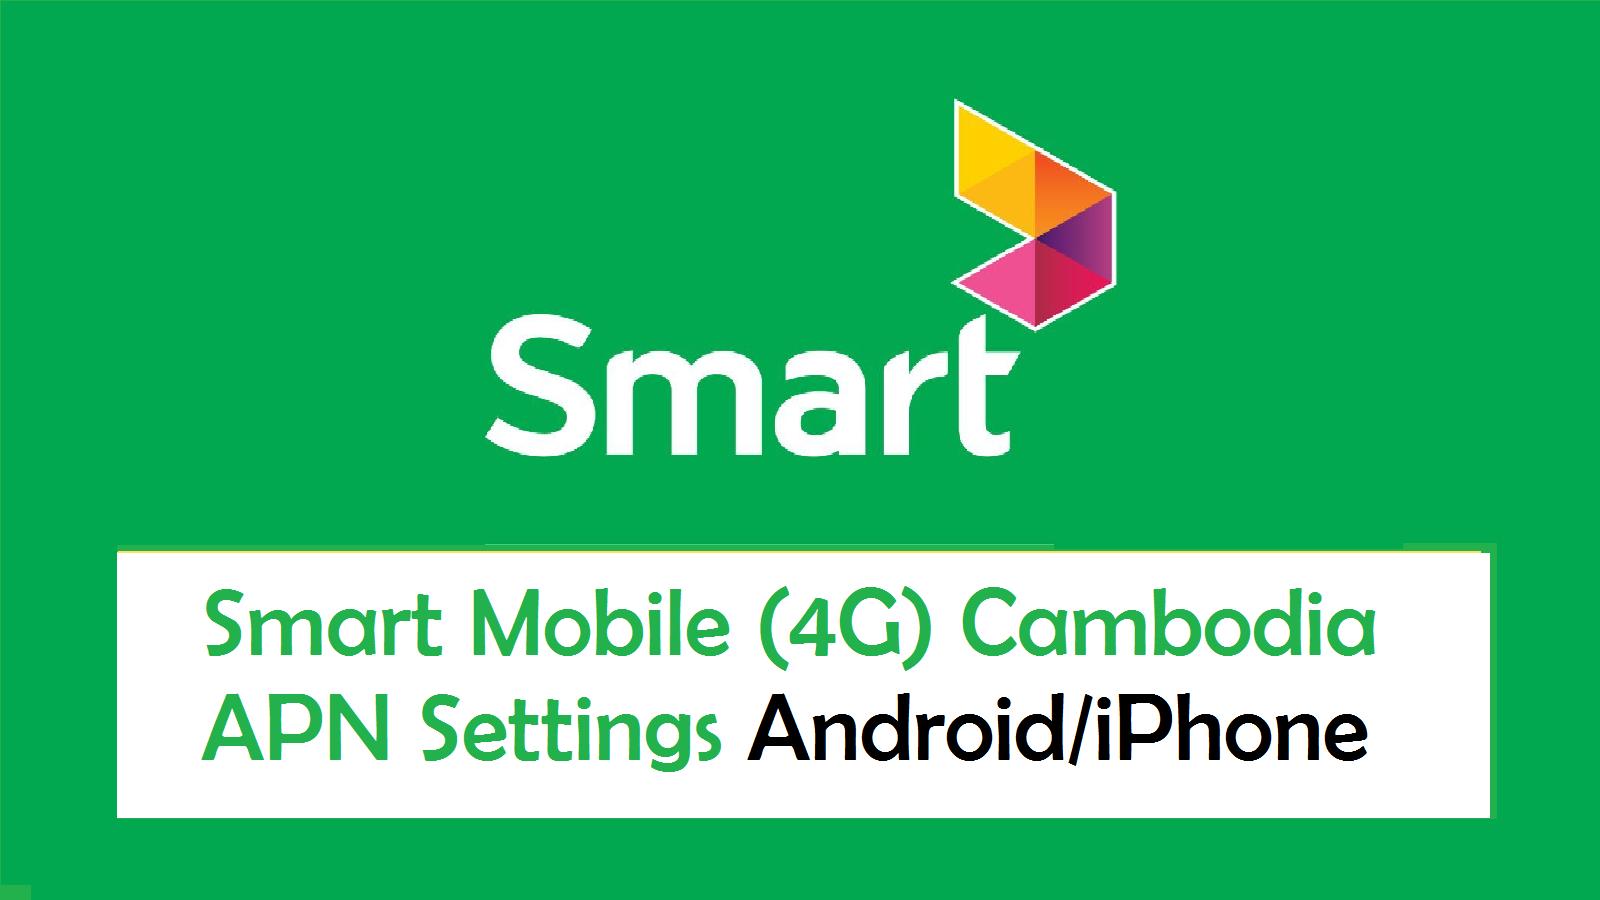 Smart Mobile (4G) Cambodia APN